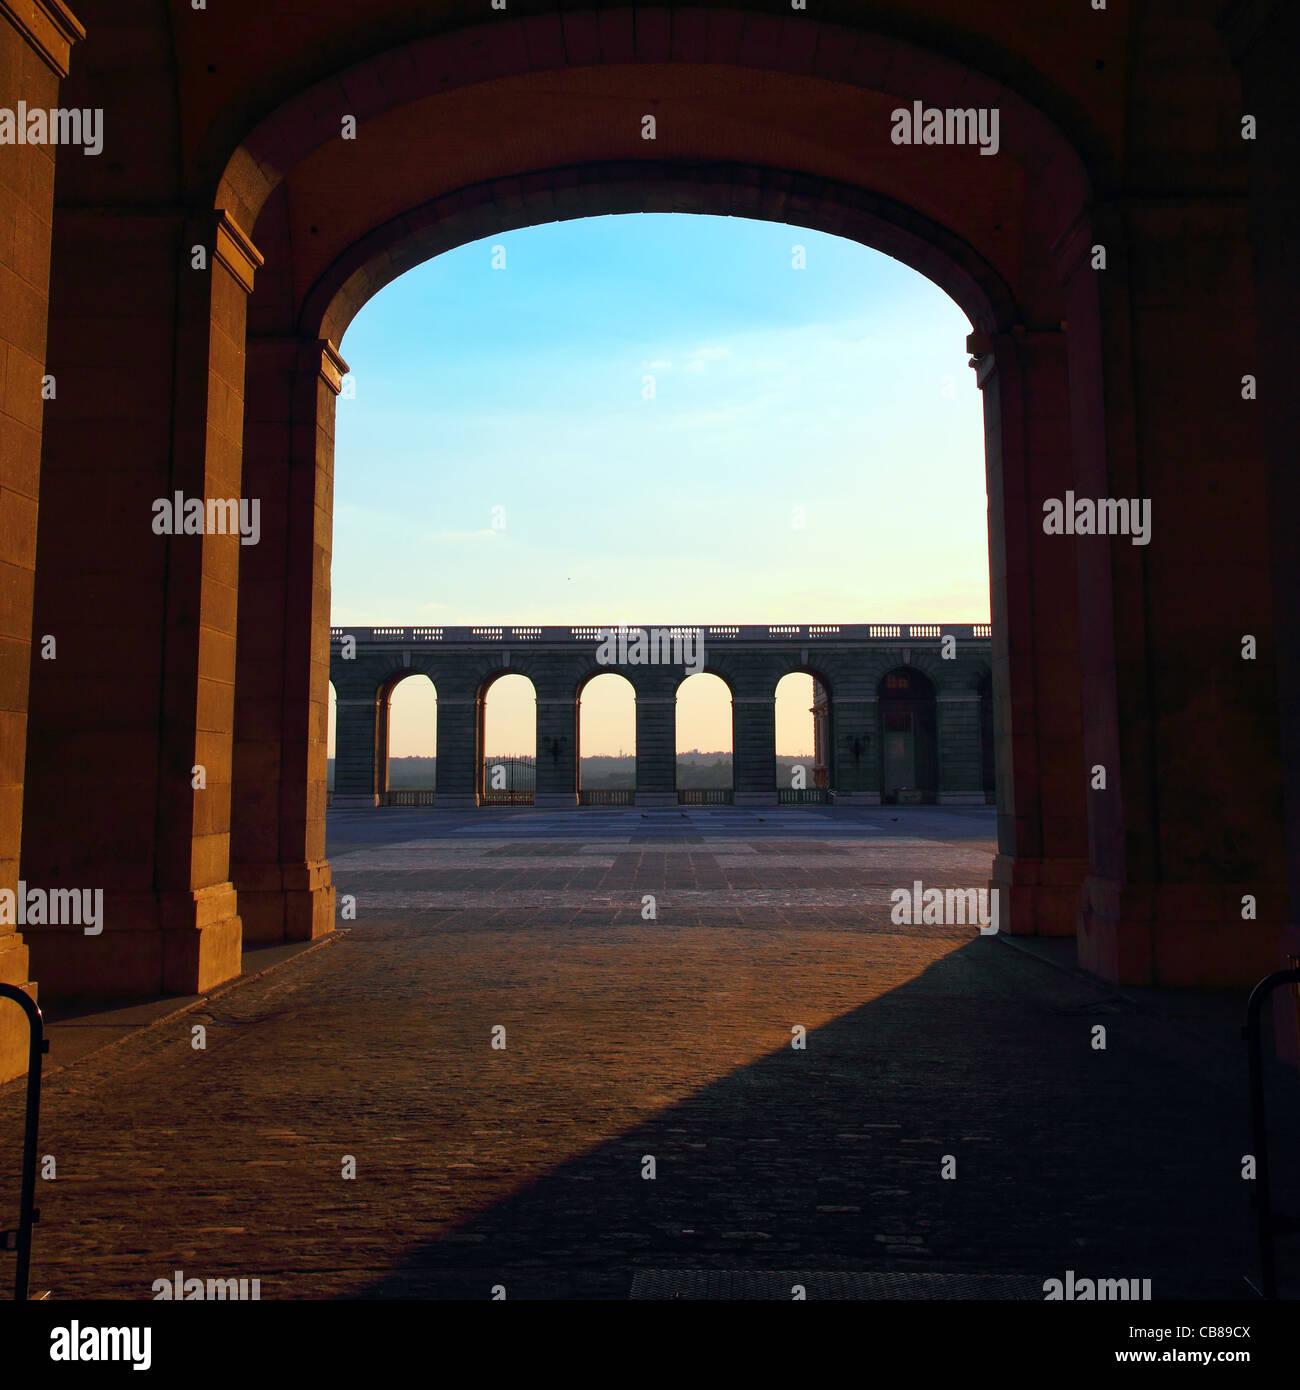 open door in palacio de oriente in madrid - Stock Image